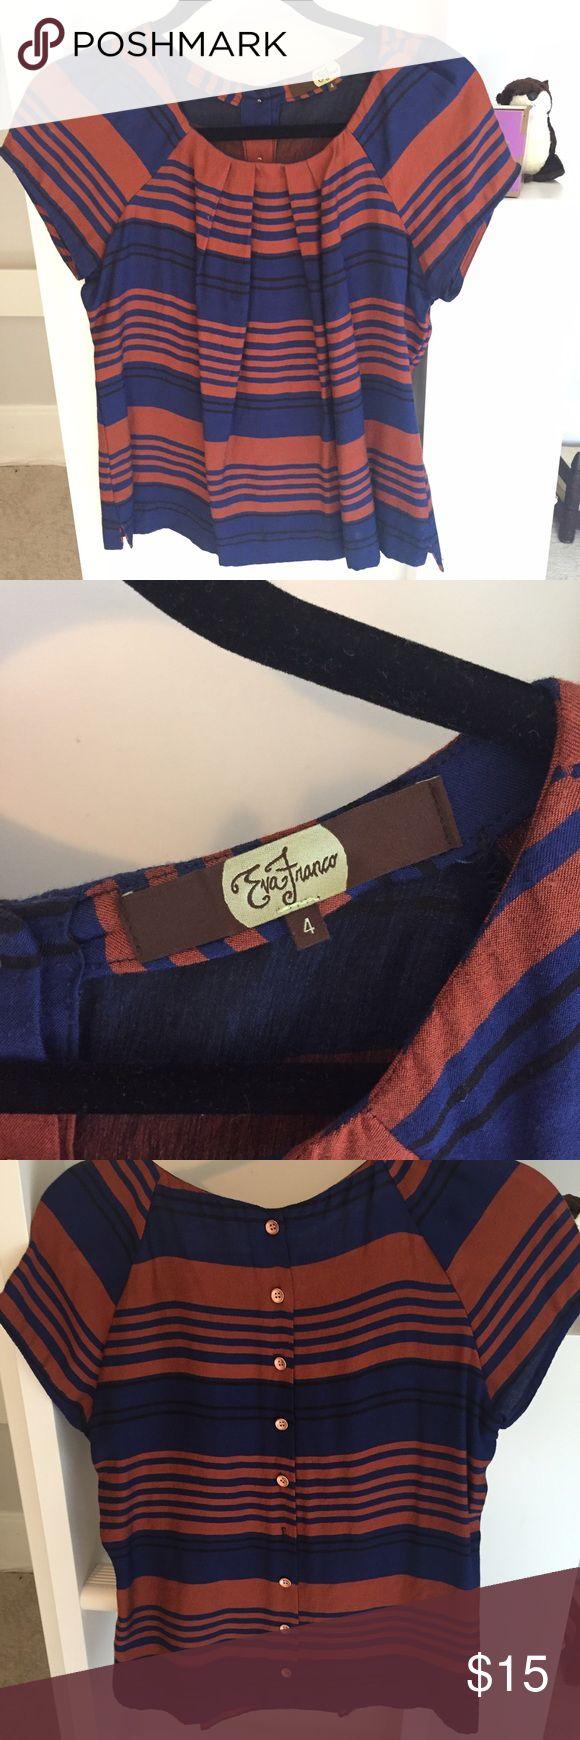 Eva Franco Blouse Eva Franco blue, rust, and black striped blouse. One button missing in the back. Eva Franco Tops Blouses